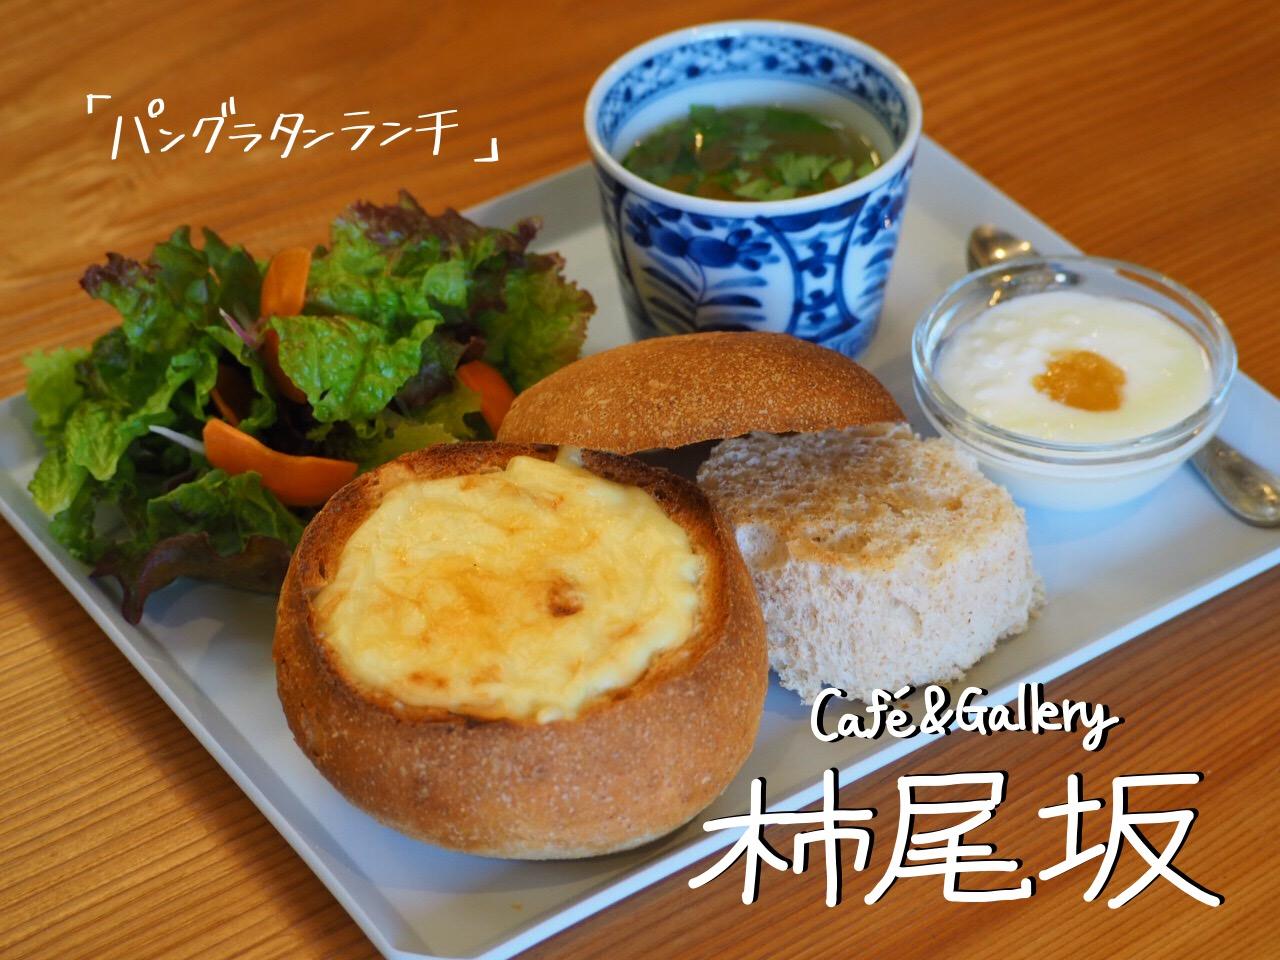 Café & Gallery 柿尾坂